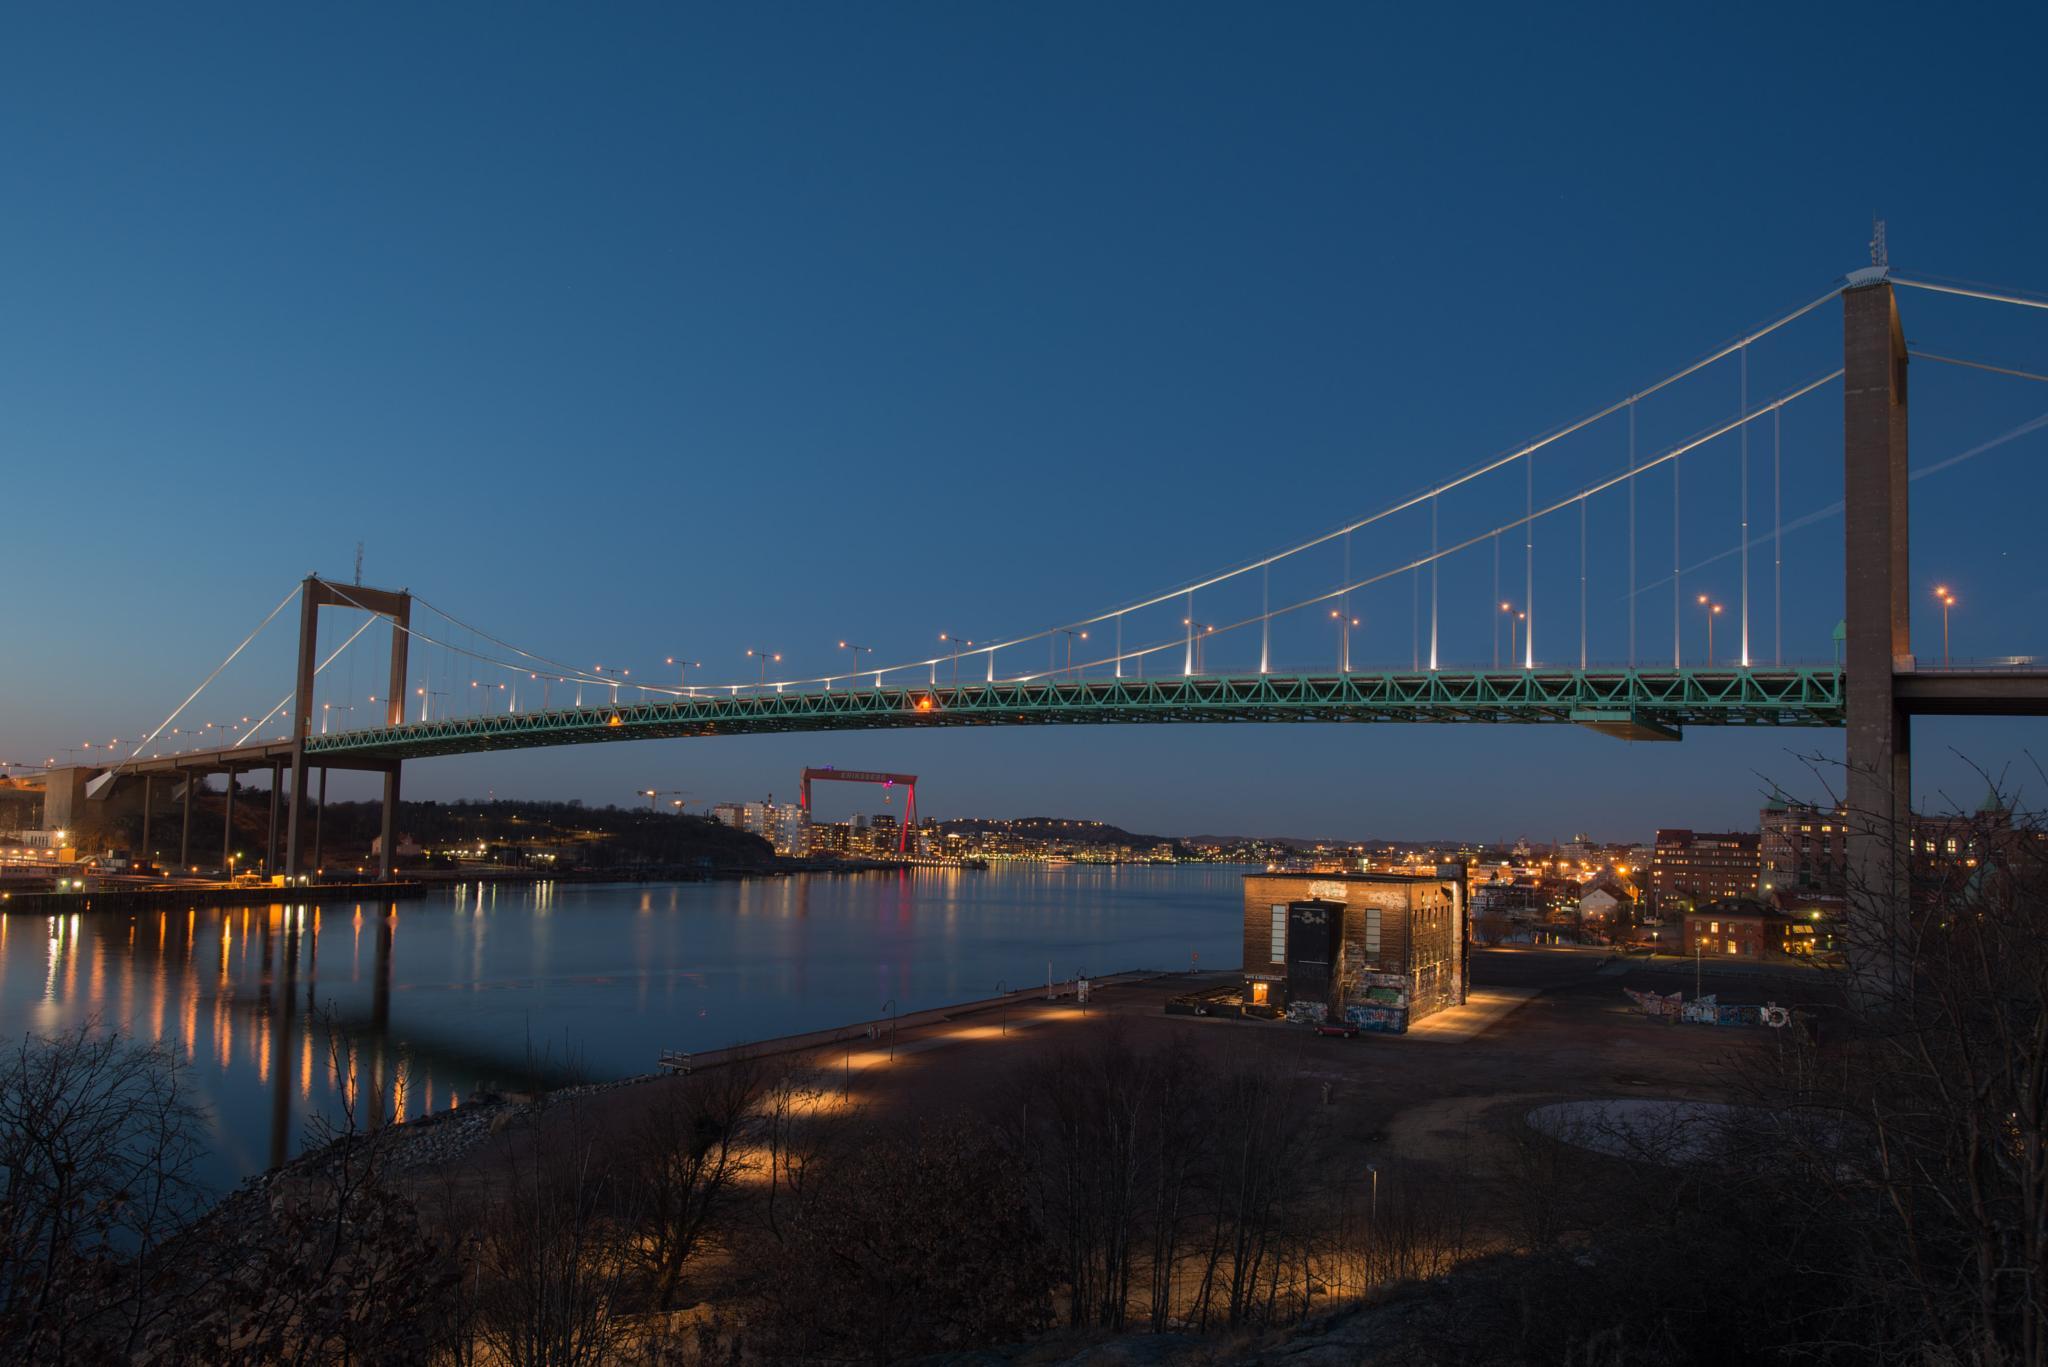 Älvsborgsbron, Göteborg by Niklas Olausson